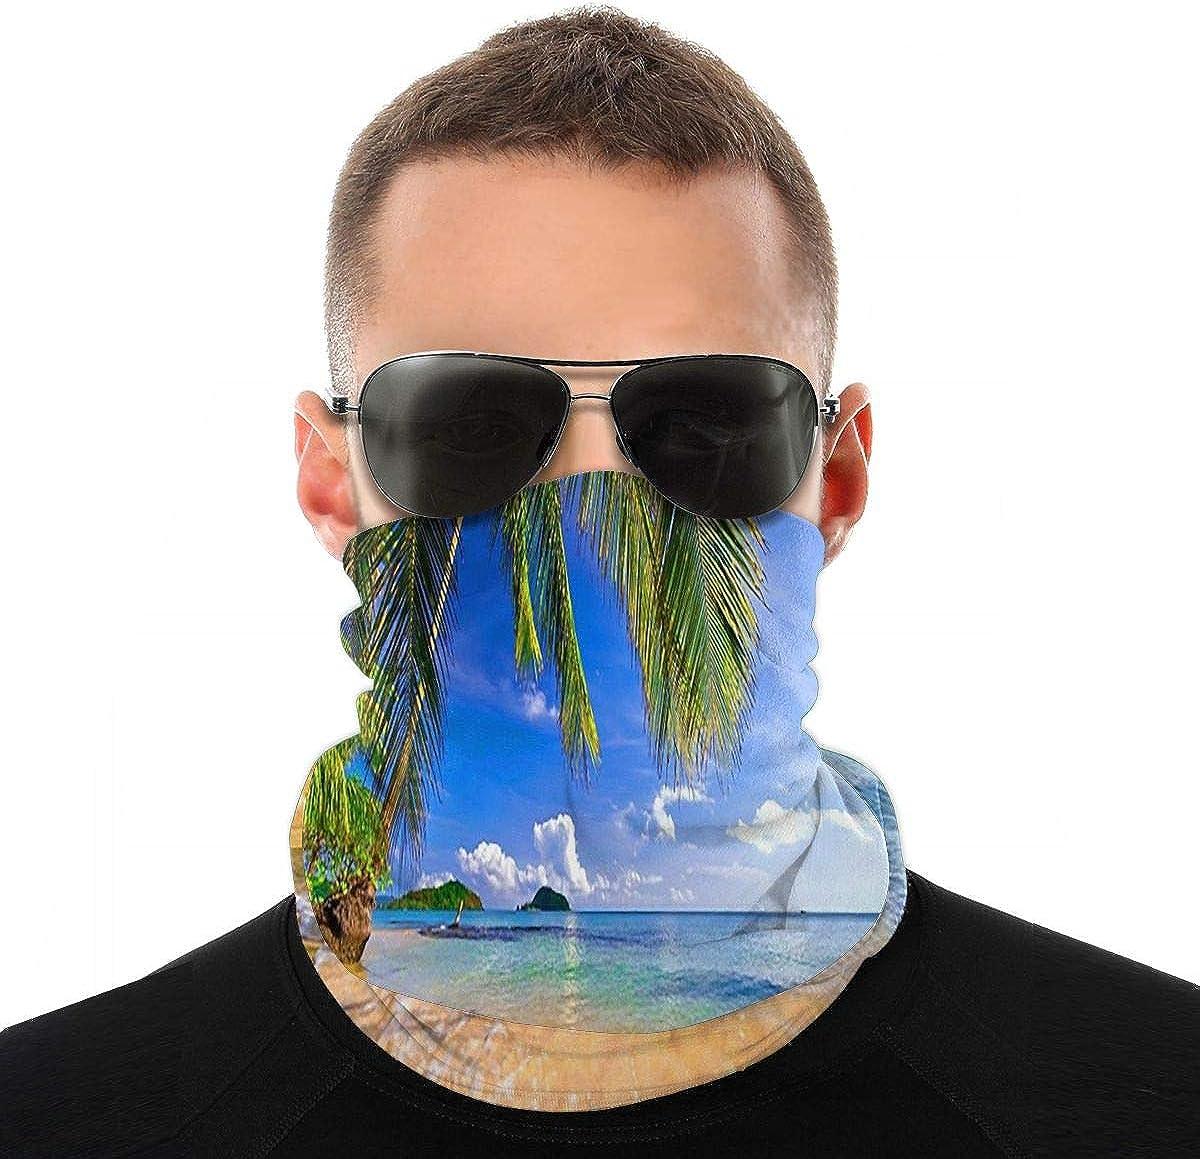 Kiuloam Bandanas Face Mask, Nature Beach Water Neck Gaiter Mask Headband for Men Women Face Scarf Dust, Outdoors, Sports